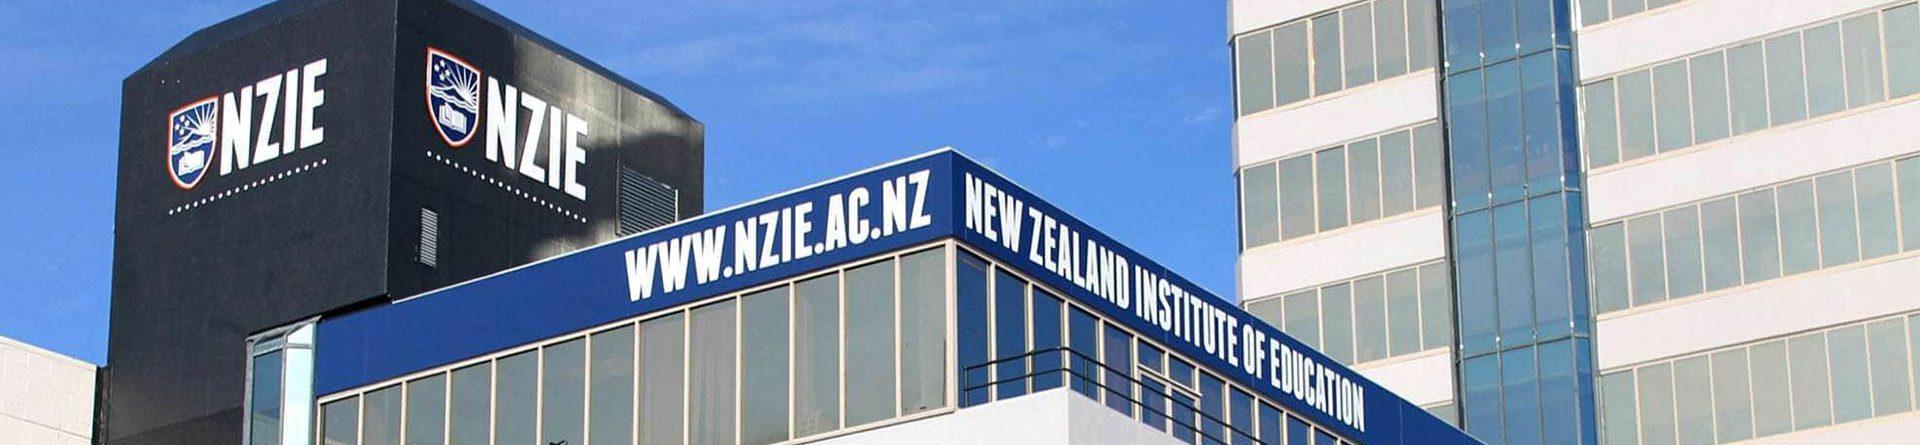 Специальное предложение от NZIE на 2020 год